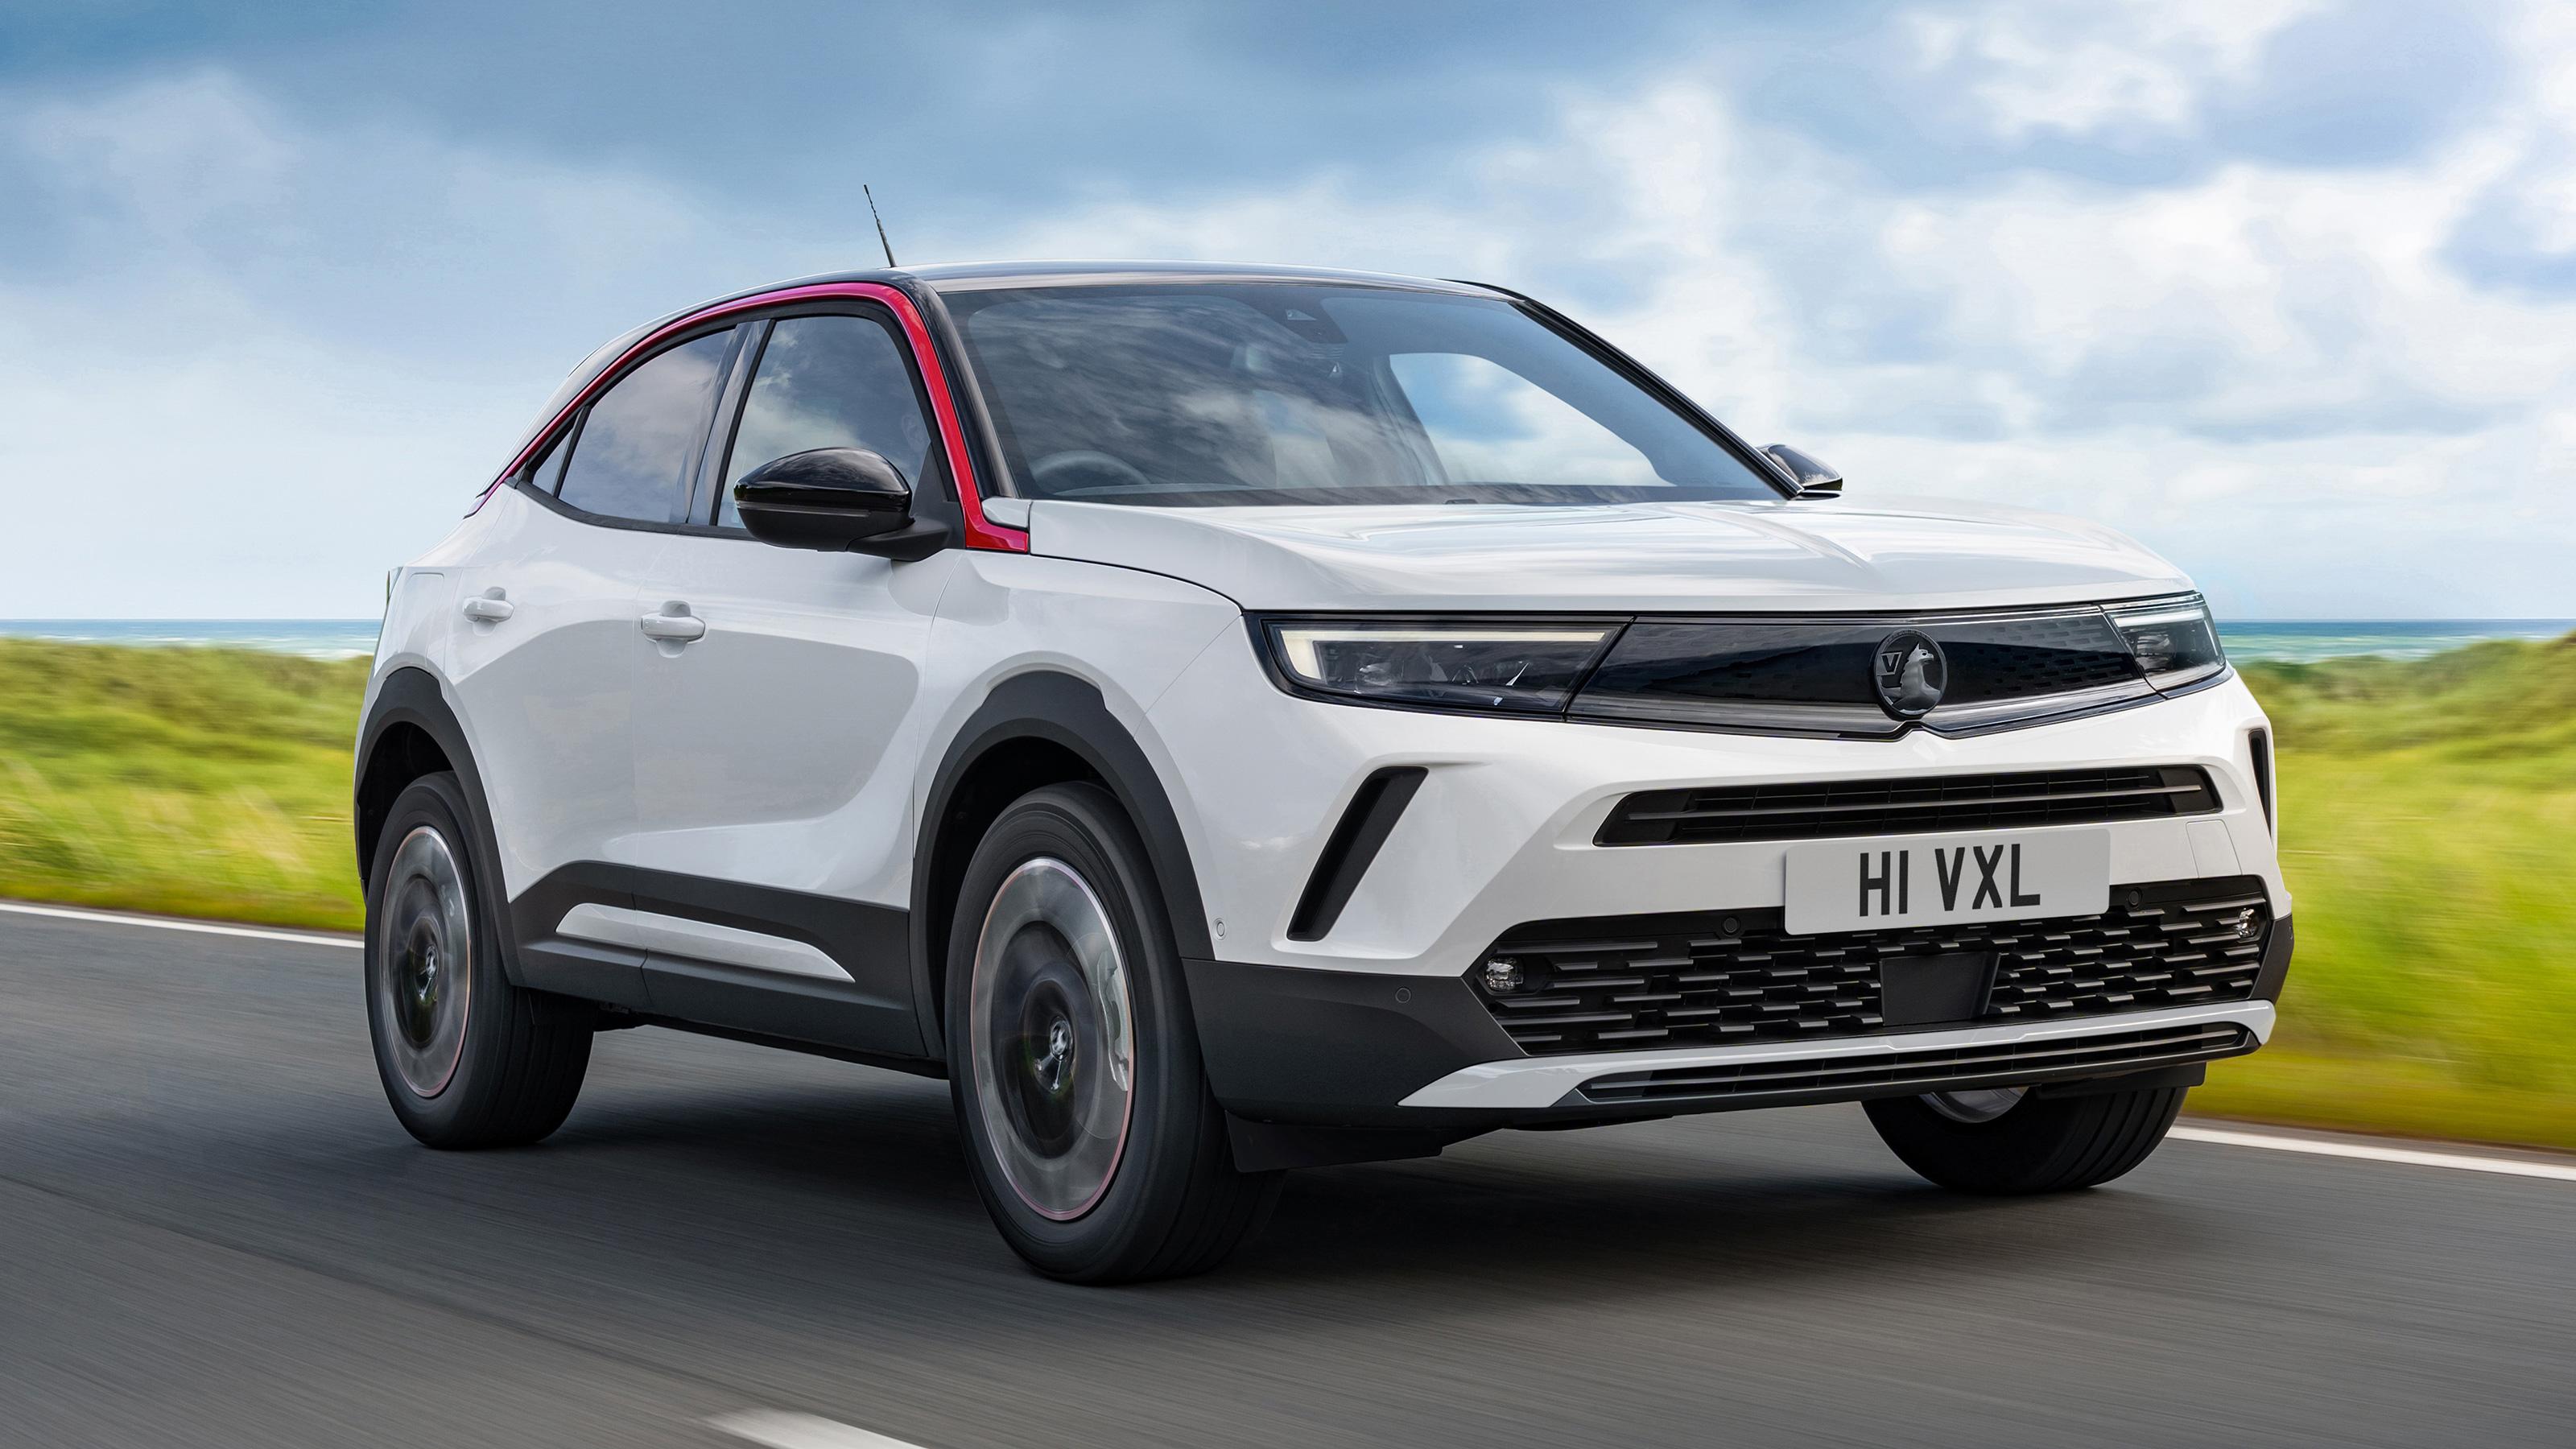 New 2021 Vauxhall Mokka SUV: engine specs confirmed | Auto ...